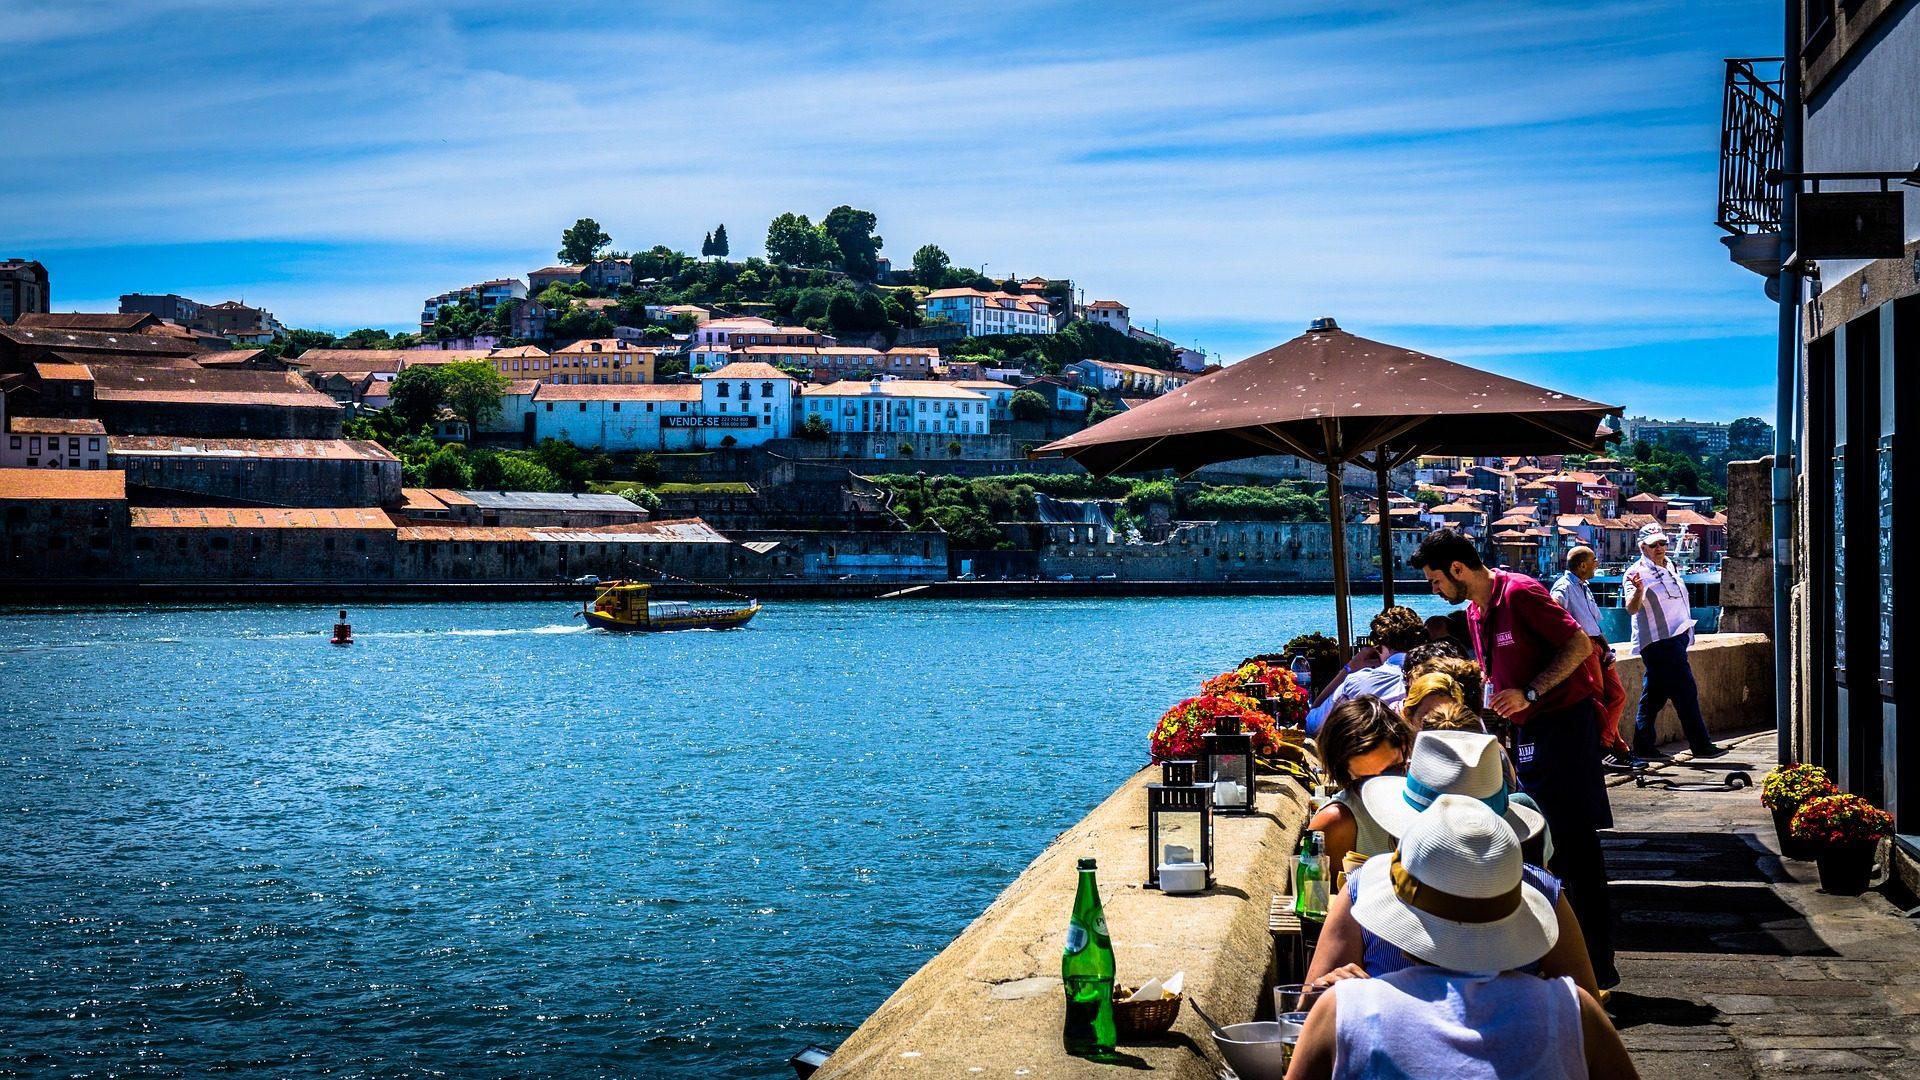 सवारी, नदी, गांव, comer, पर्यटन, porto, पुर्तगाल - HD वॉलपेपर - प्रोफेसर-falken.com